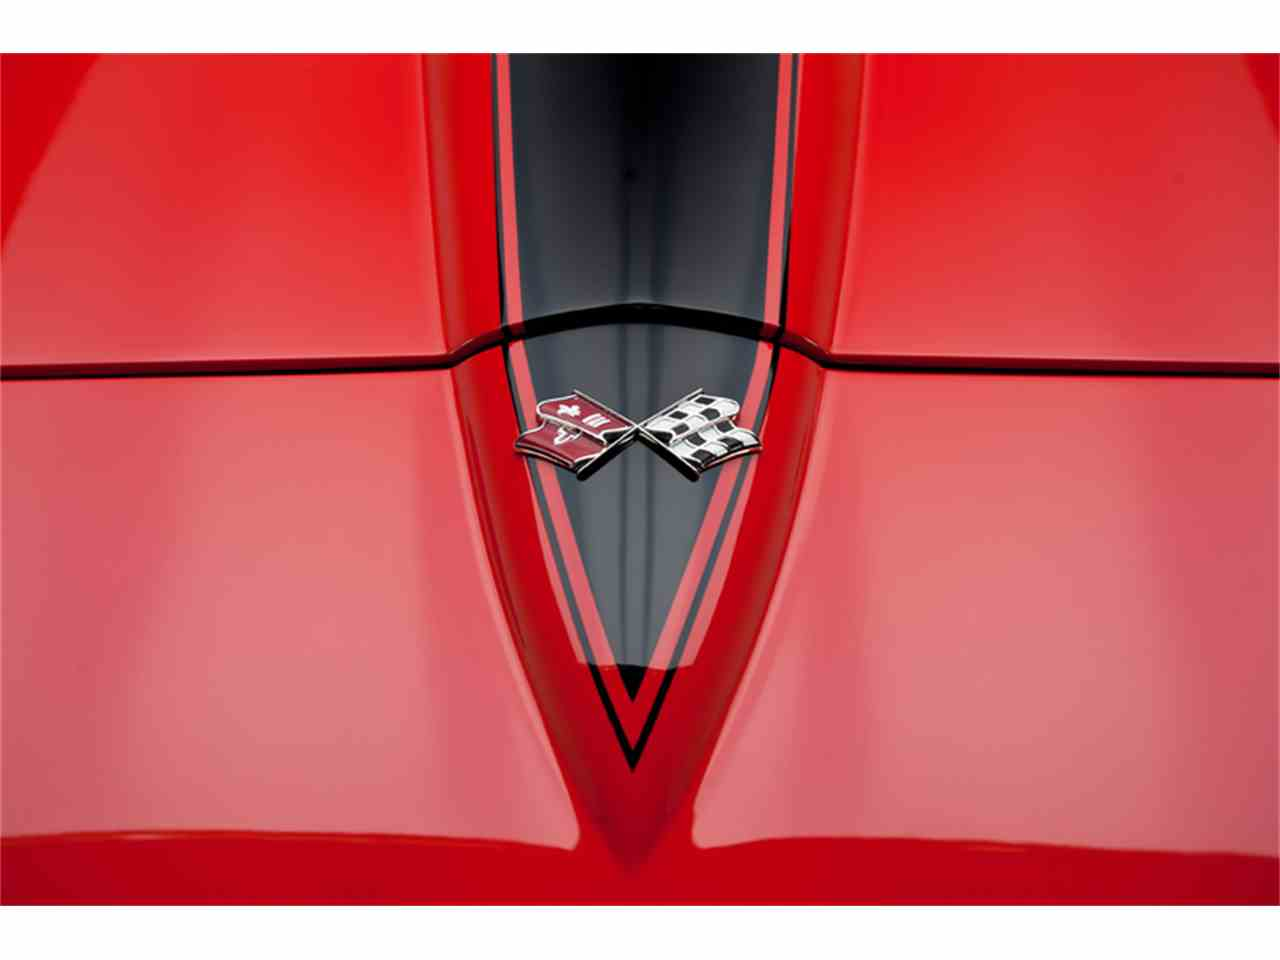 Large Picture of '64 Chevrolet Corvette Stingray located in Charlotte North Carolina - $119,900.00 - LT7F